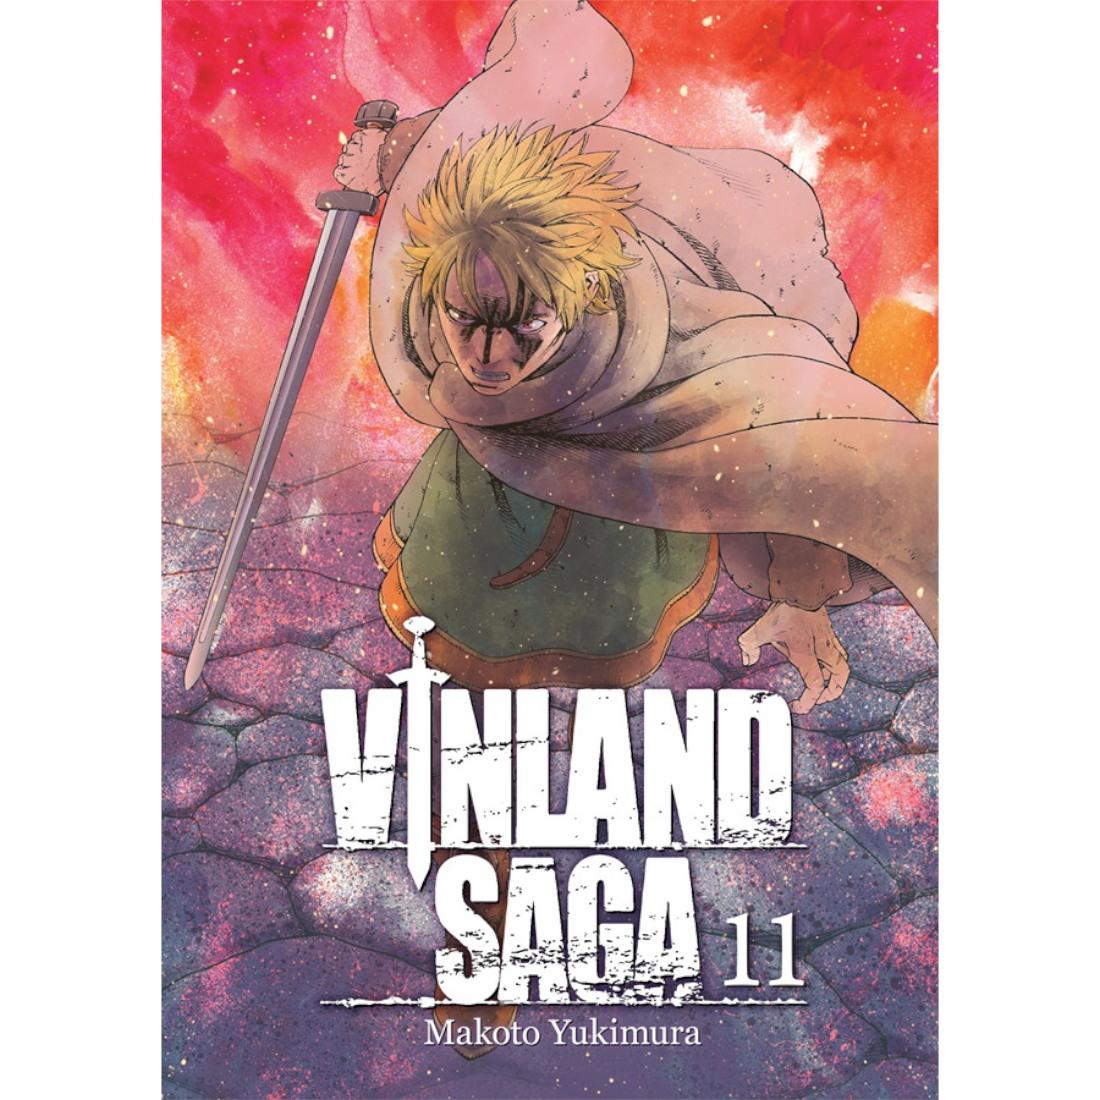 Vinland Saga Deluxe Vol. 11